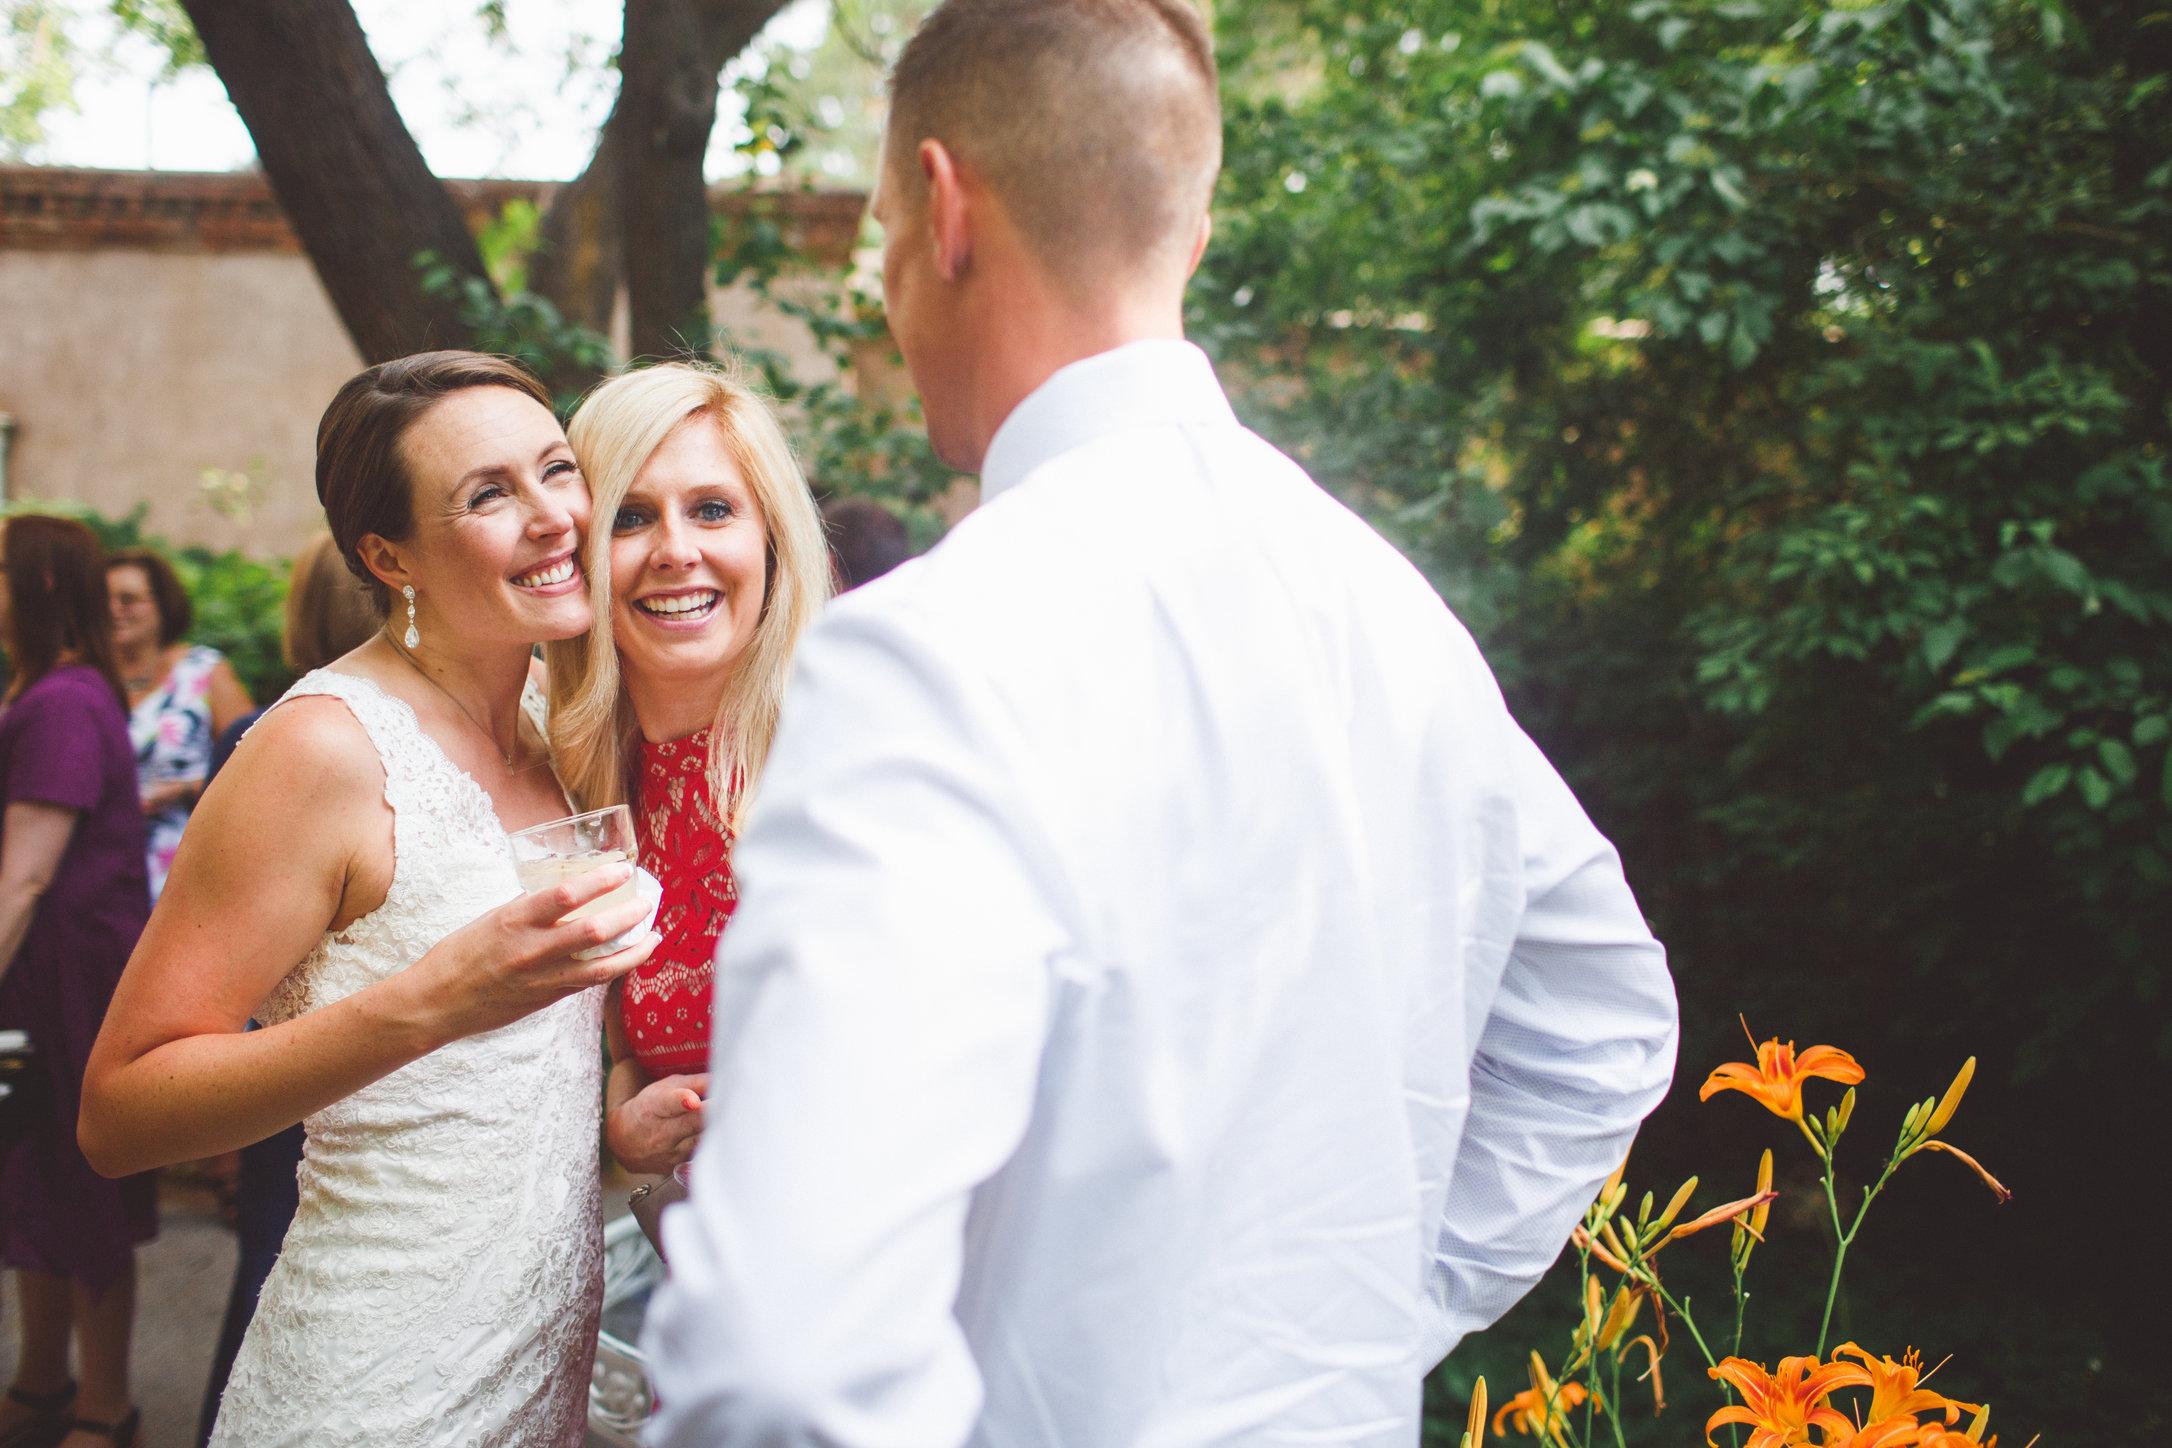 SandC-wedding-428.jpg